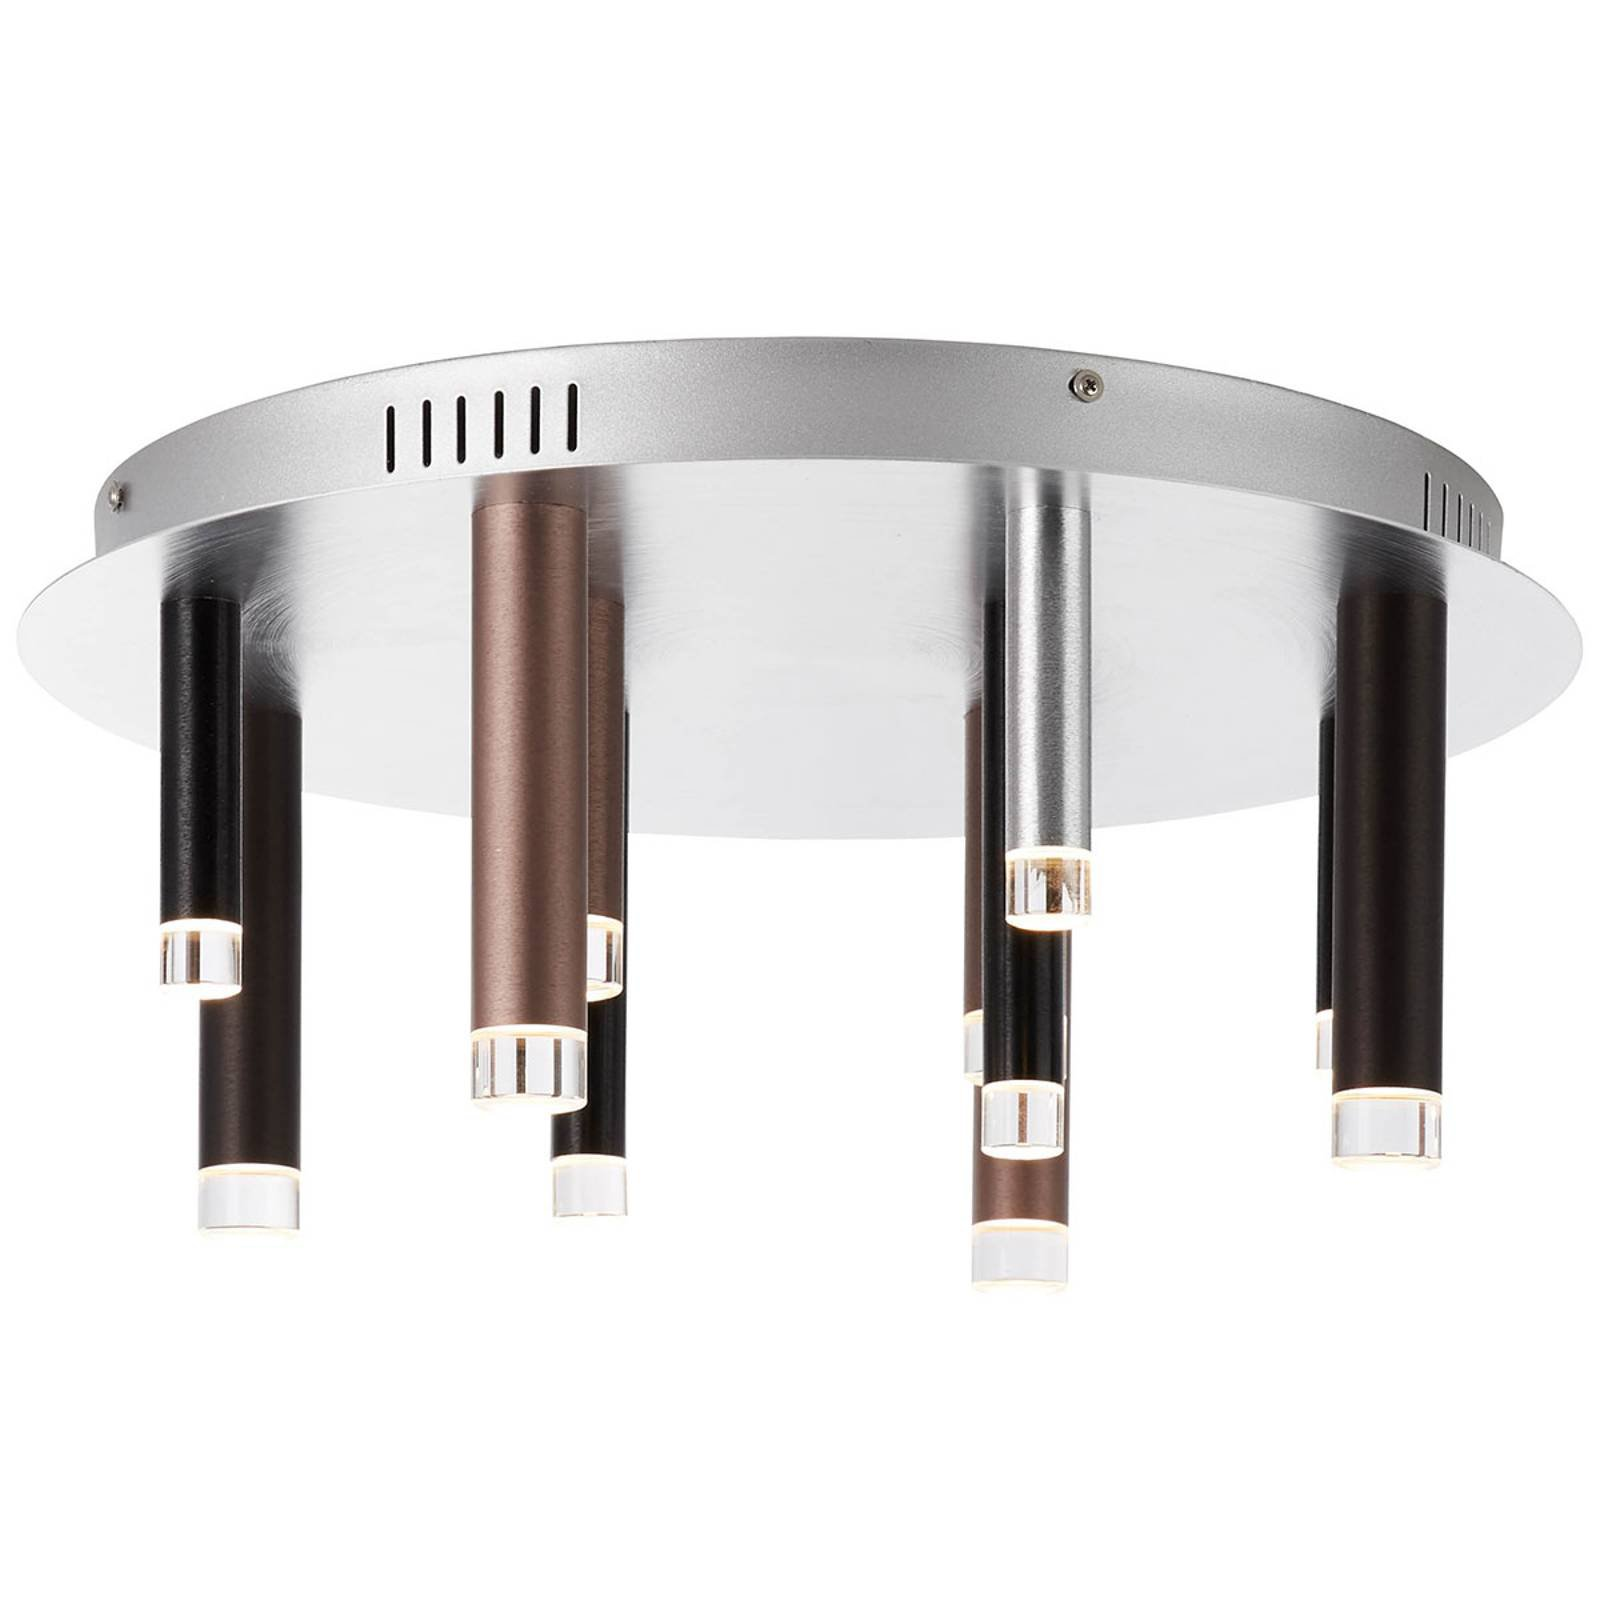 LED-taklampe Cembalo dimbar 12 lyskilder